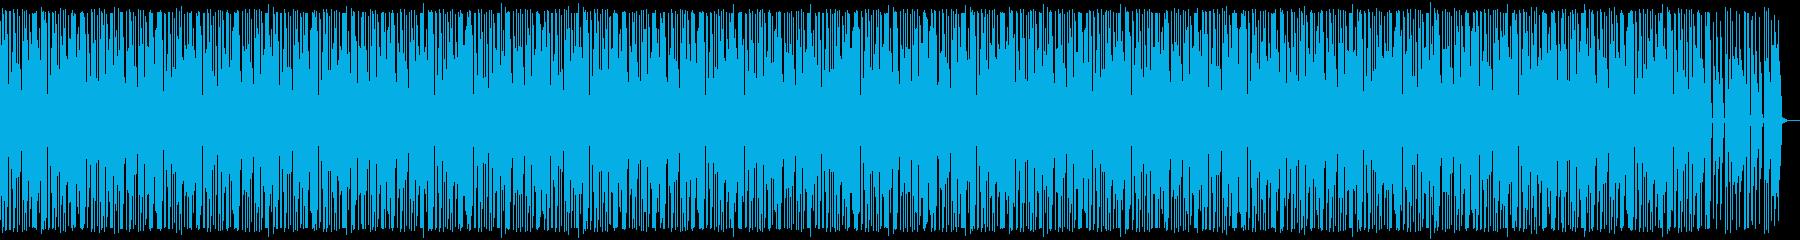 Ennui Marimba Melancholy Norinori's reproduced waveform